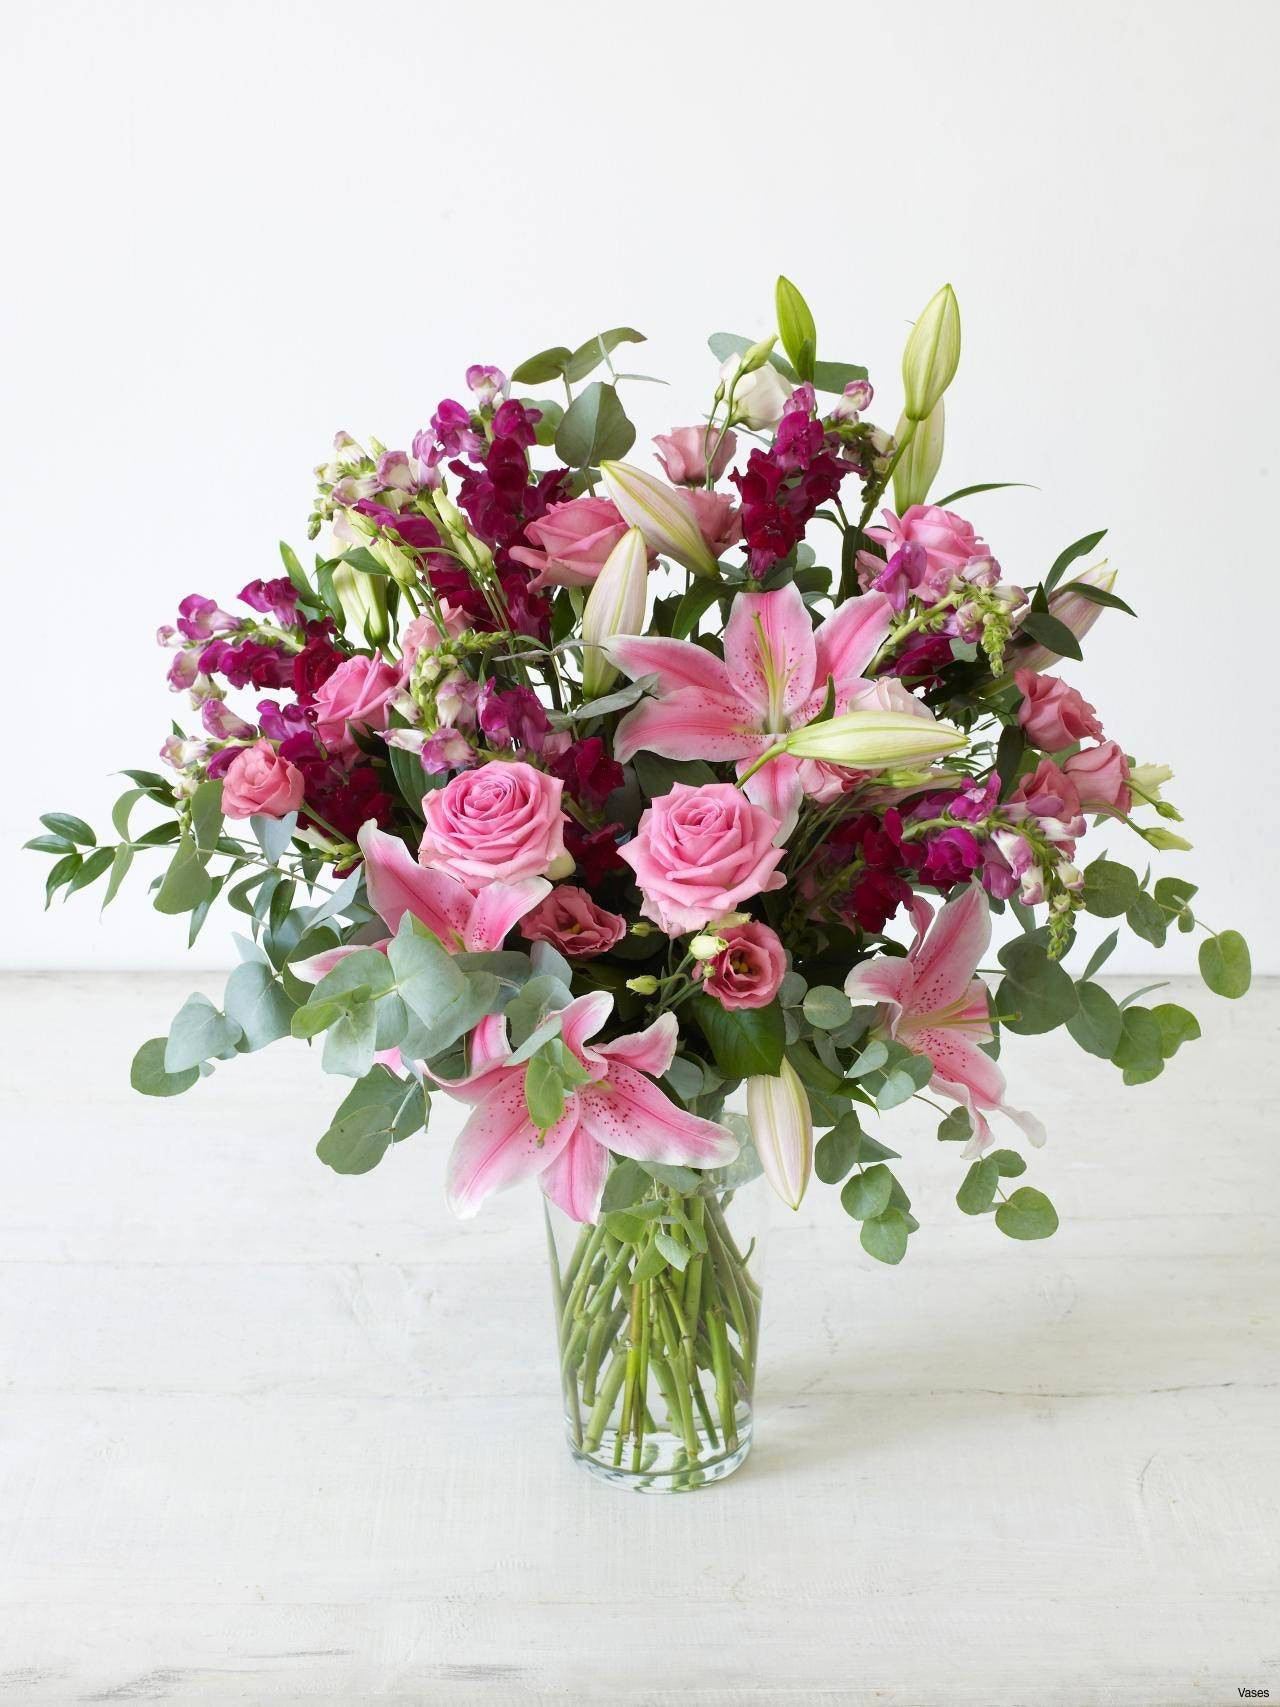 pink tulip vase of pink and green wedding decoration luxury flower arrangements elegant regarding pink and green wedding decoration luxury flower arrangements elegant floral arrangements 0d design ideas